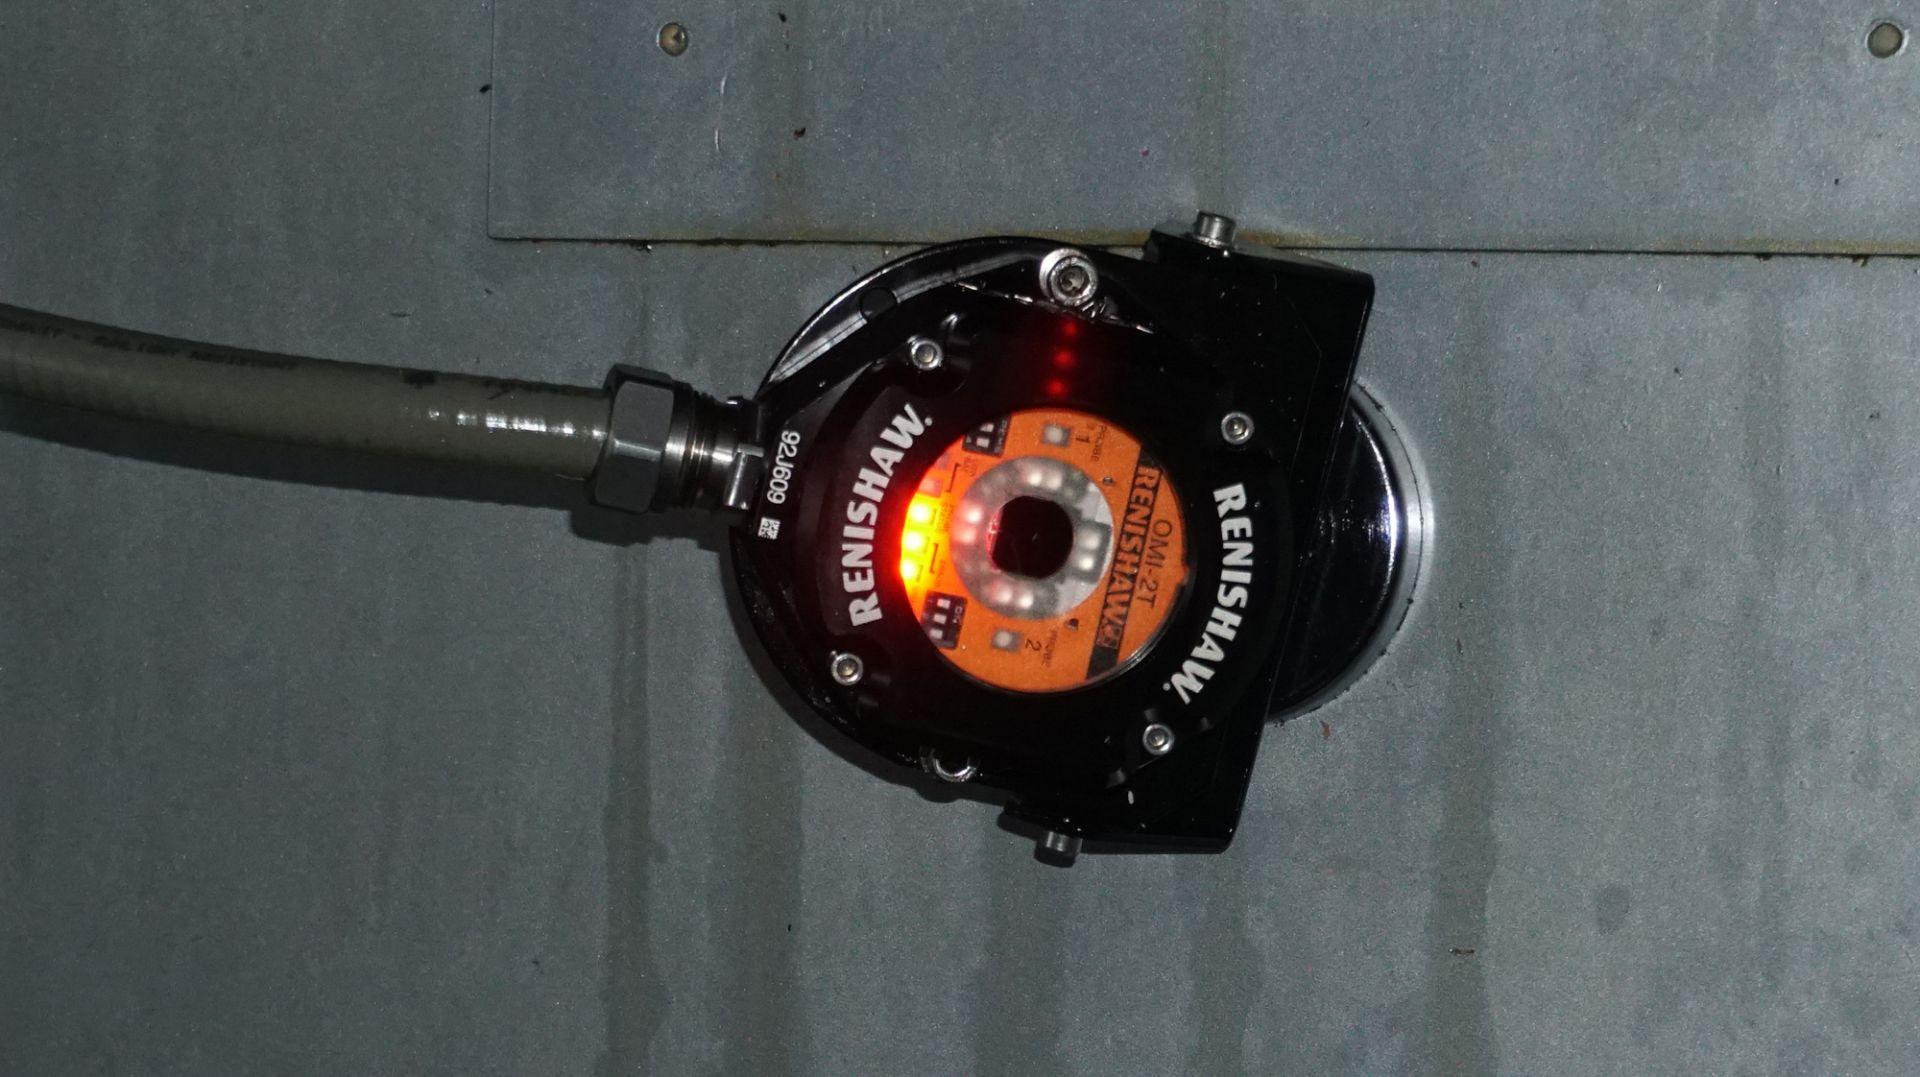 HURCO (2012) VMX42UI 5 AXIS CNC VERTICAL MACHINING CENTER WITH HURCO DUAL SCREEN CNC CONTROL, 13. - Image 10 of 20